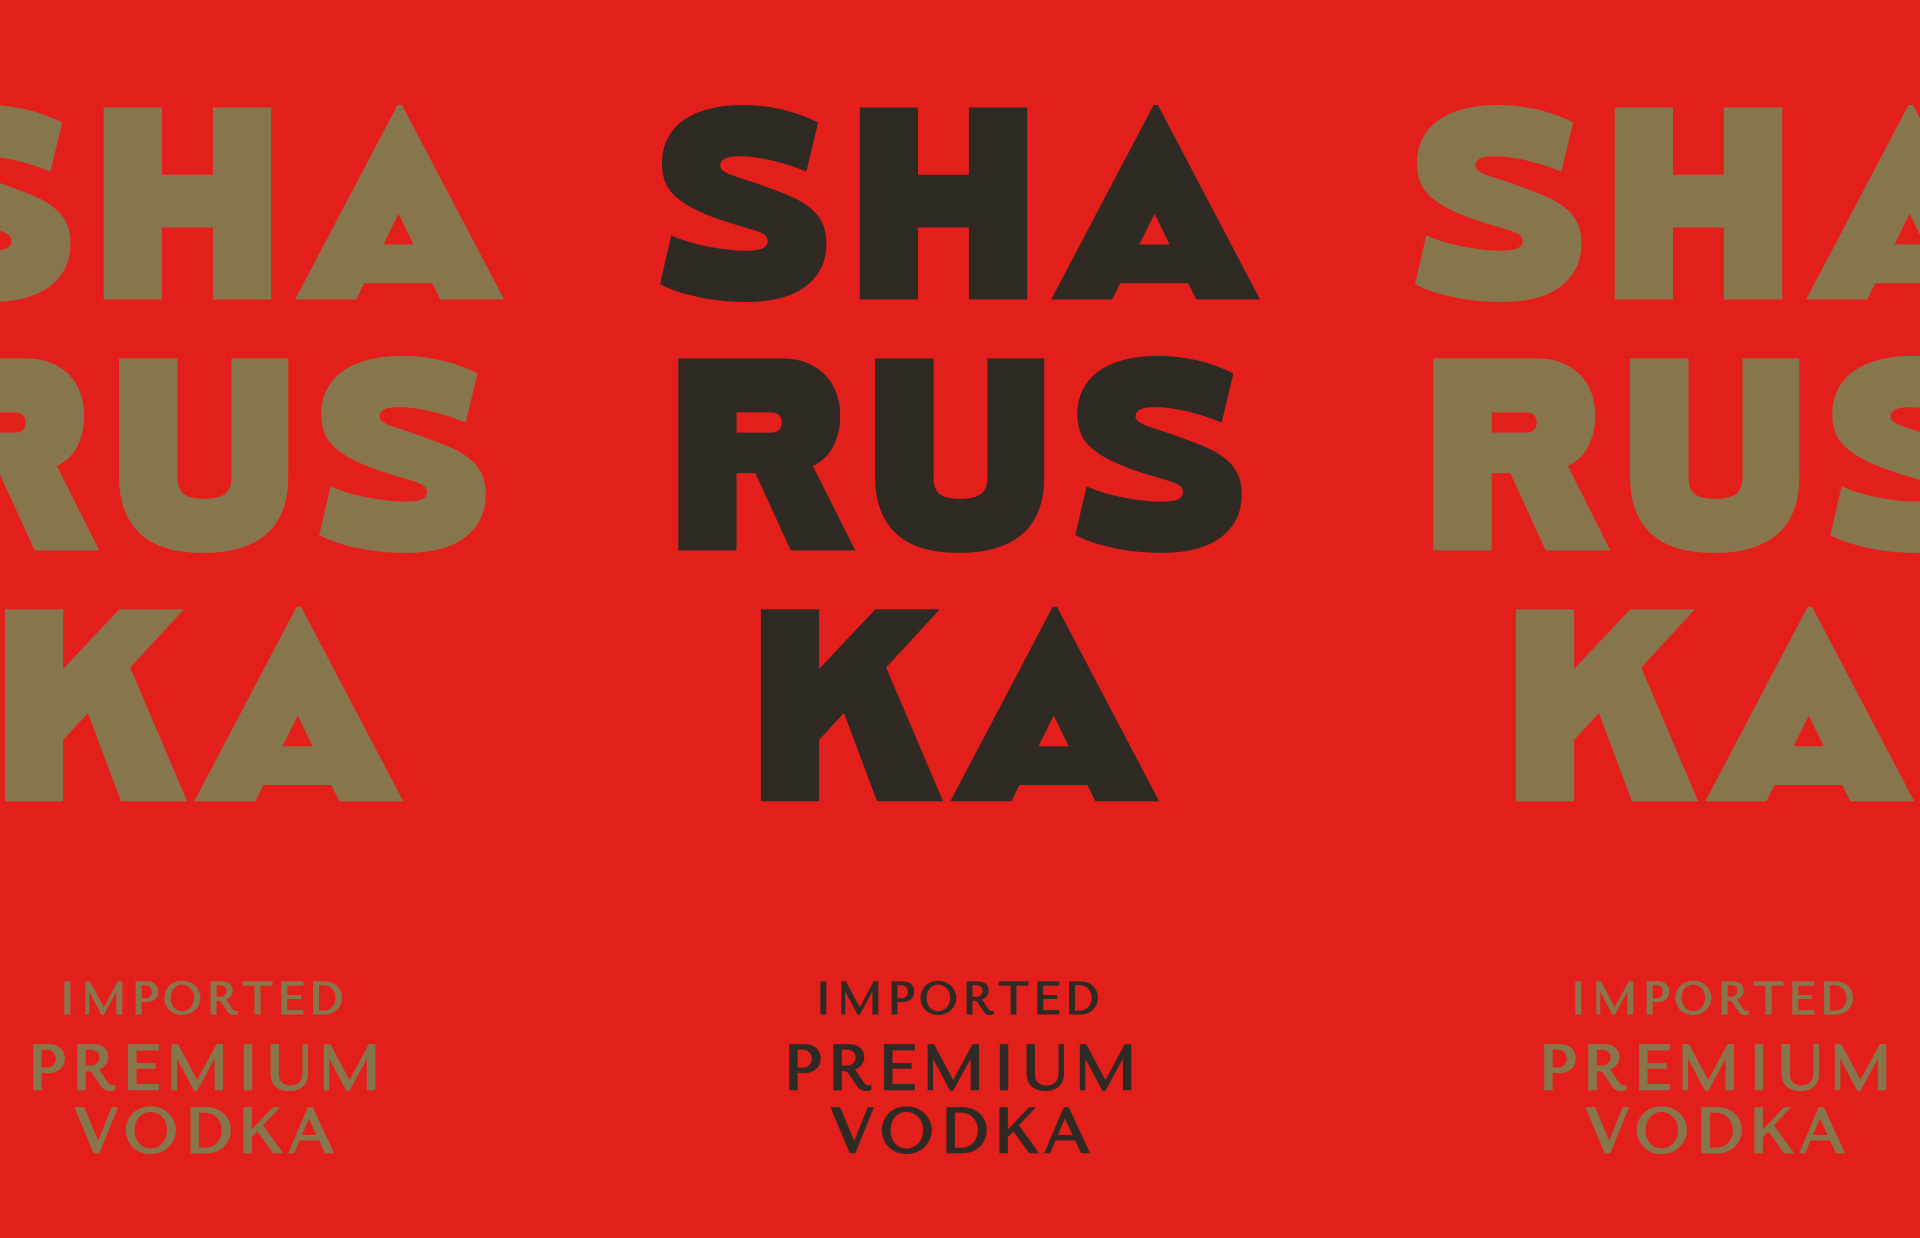 sharuska_5